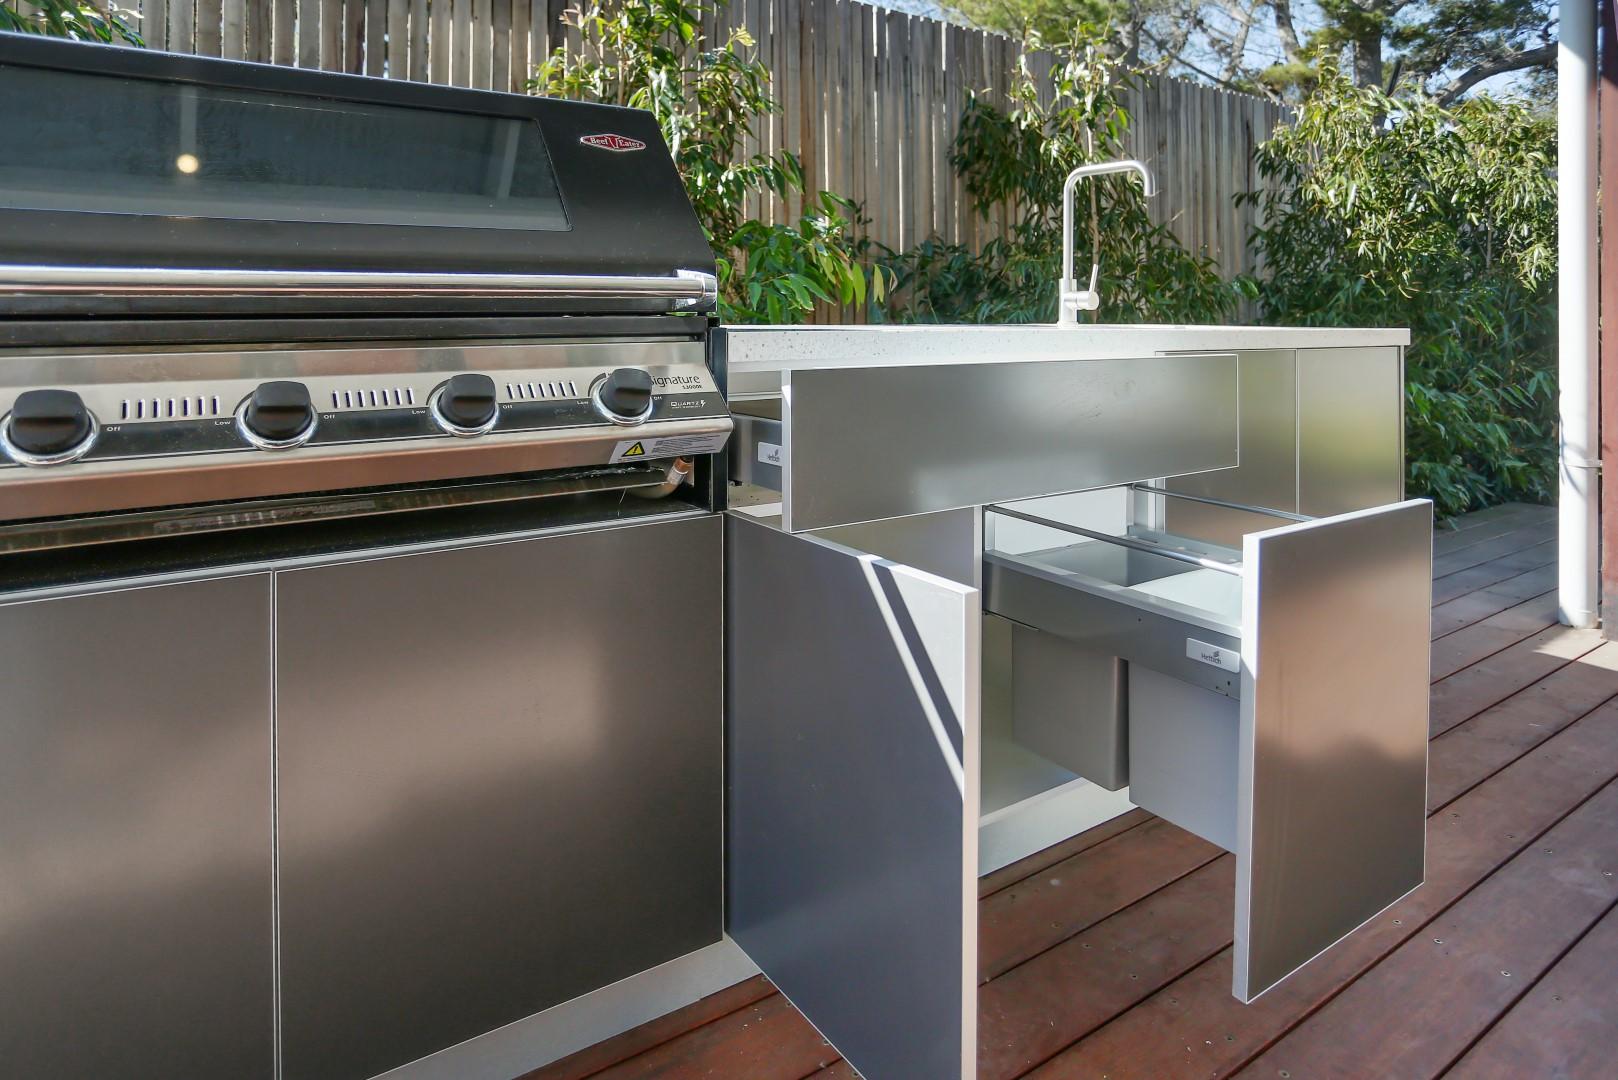 Beefeater 3000E 5 BNR Metallic Charcoal Corian Silver Birch Outdoor Kitchen 6LR